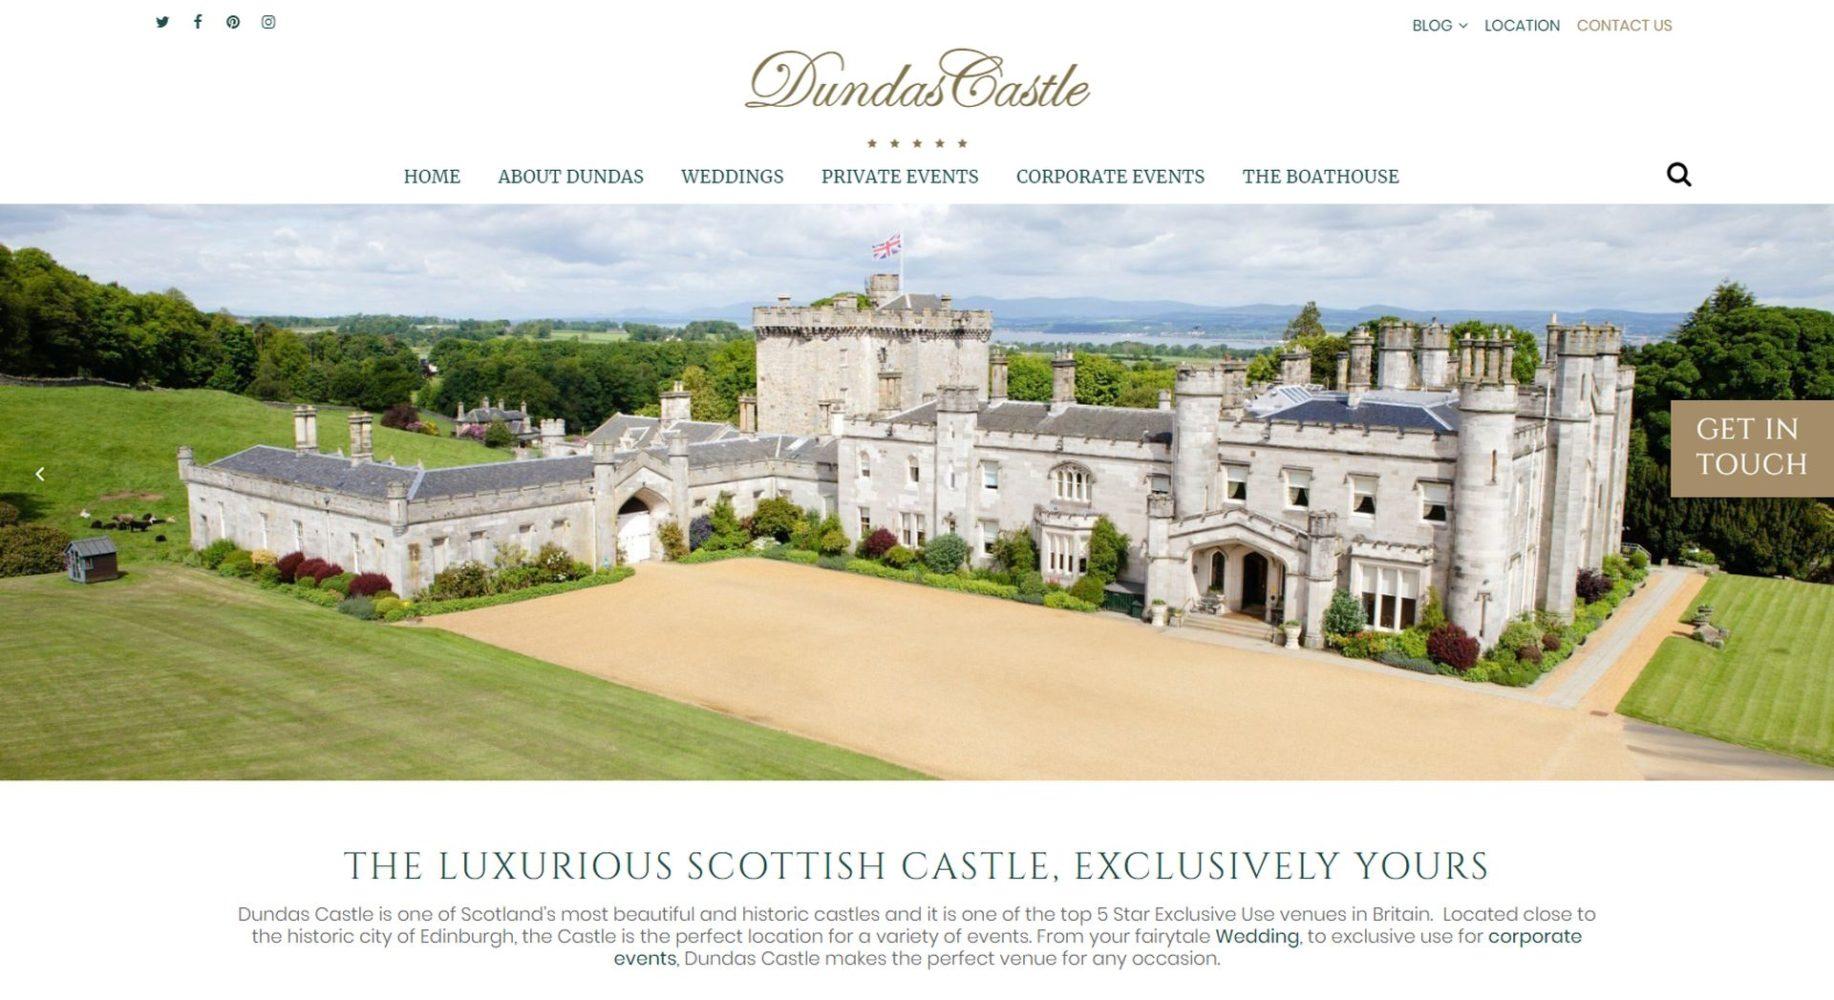 Dundas Castle Website Design Homepage